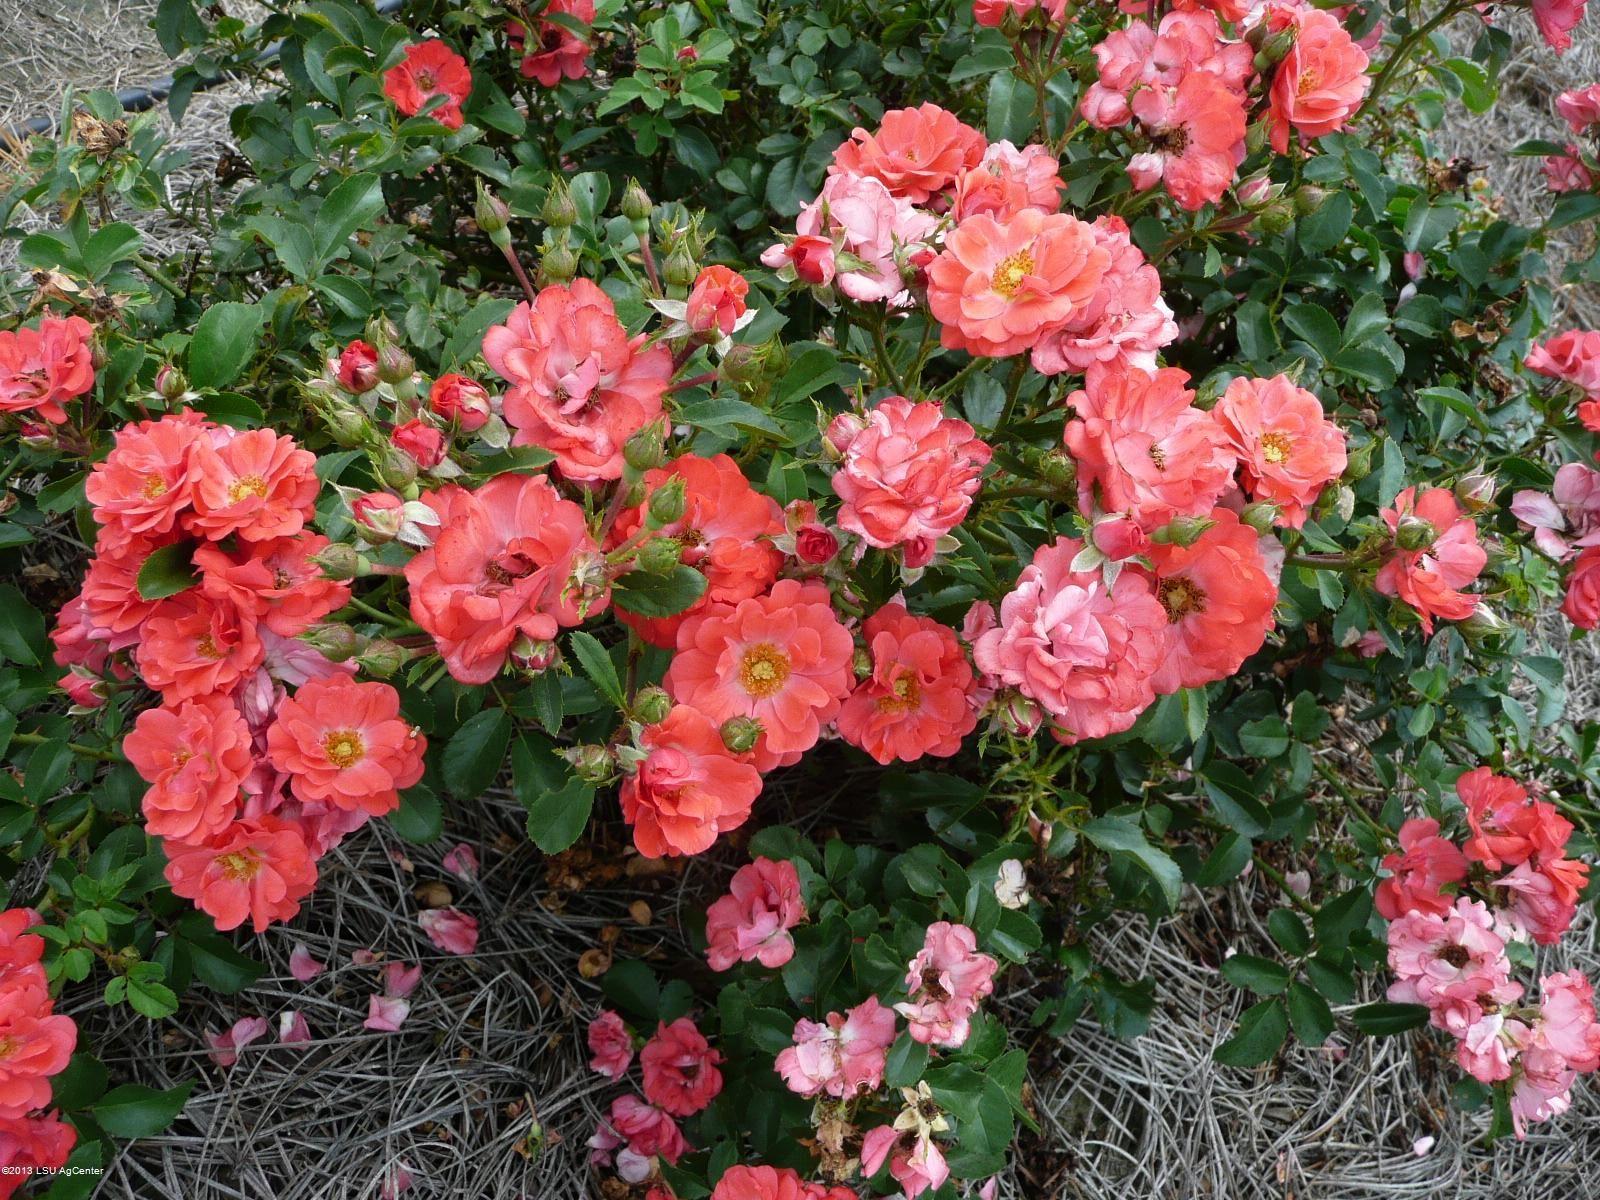 Drift Roses Coral Color Coral Drift Flowers Peach Drift Flowers Pink Drift Flowers Red Drift Drift Roses Rose Fertilizer Rose Garden Landscape